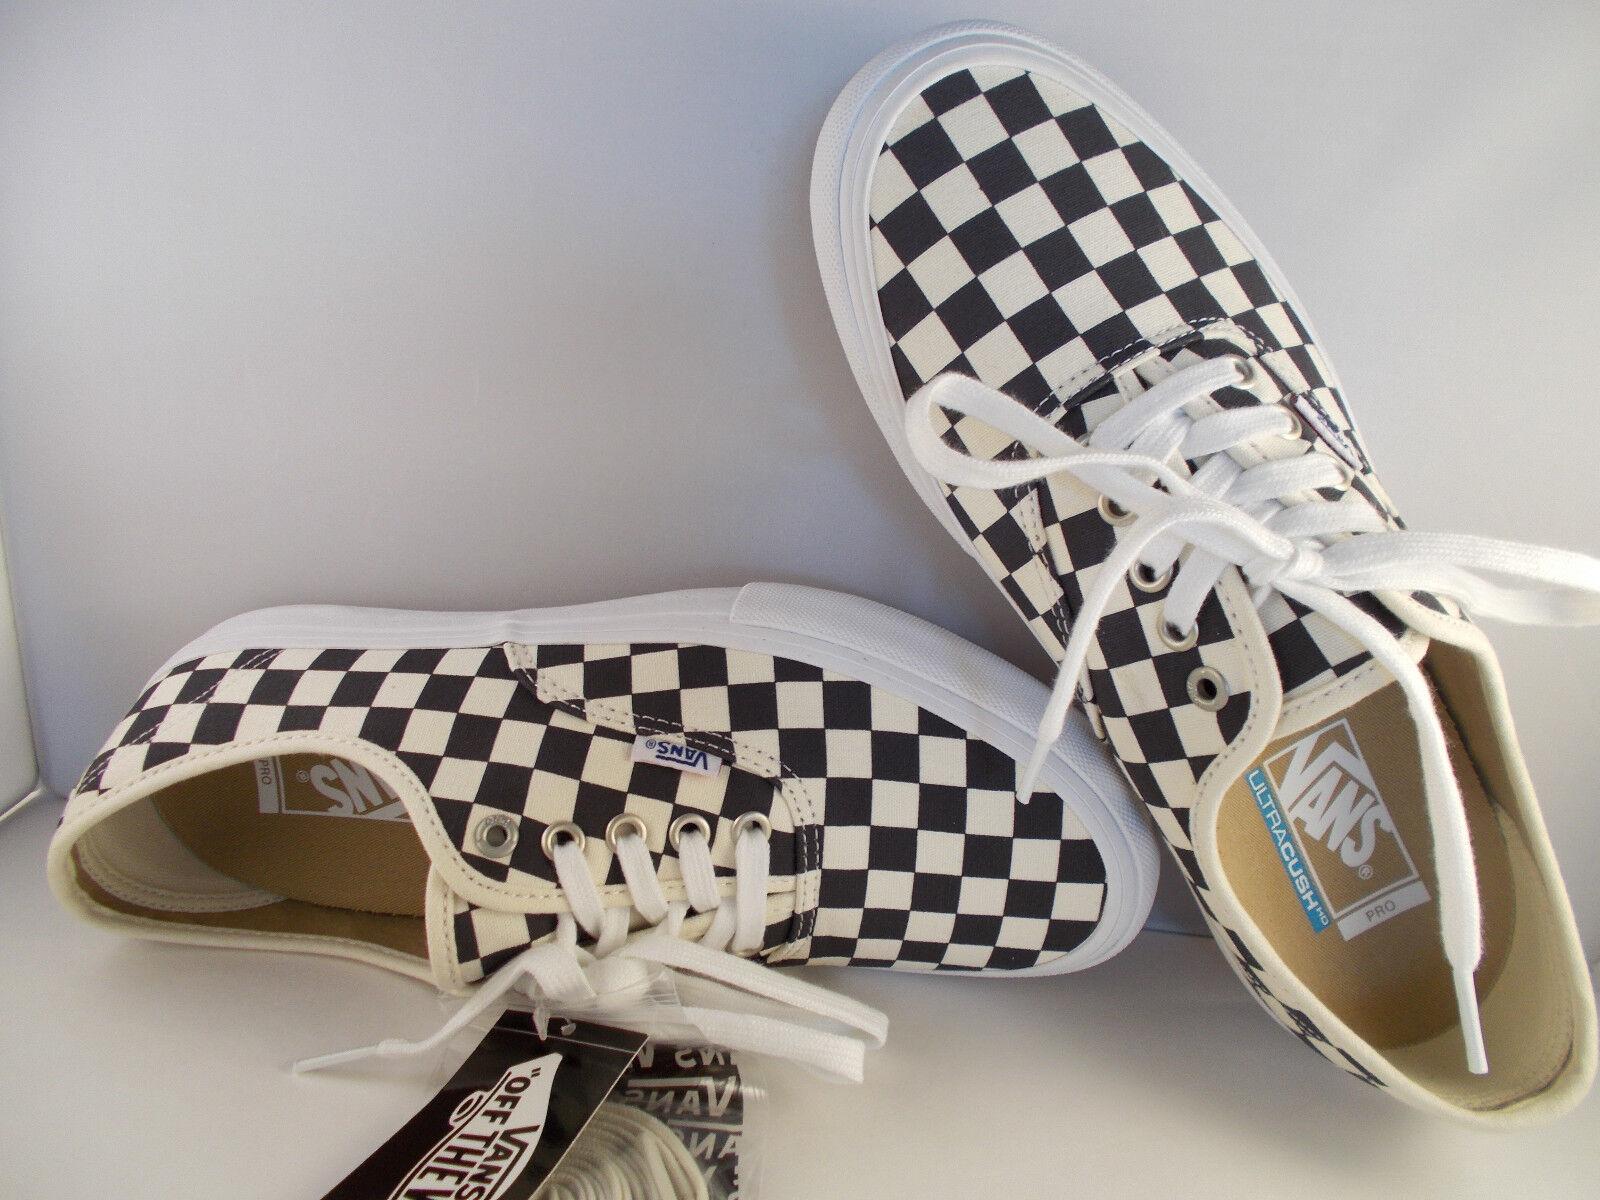 VANS Authentic Pro Checkerboard Navy Ultracush Skateboarding Shoes Men Sz 11